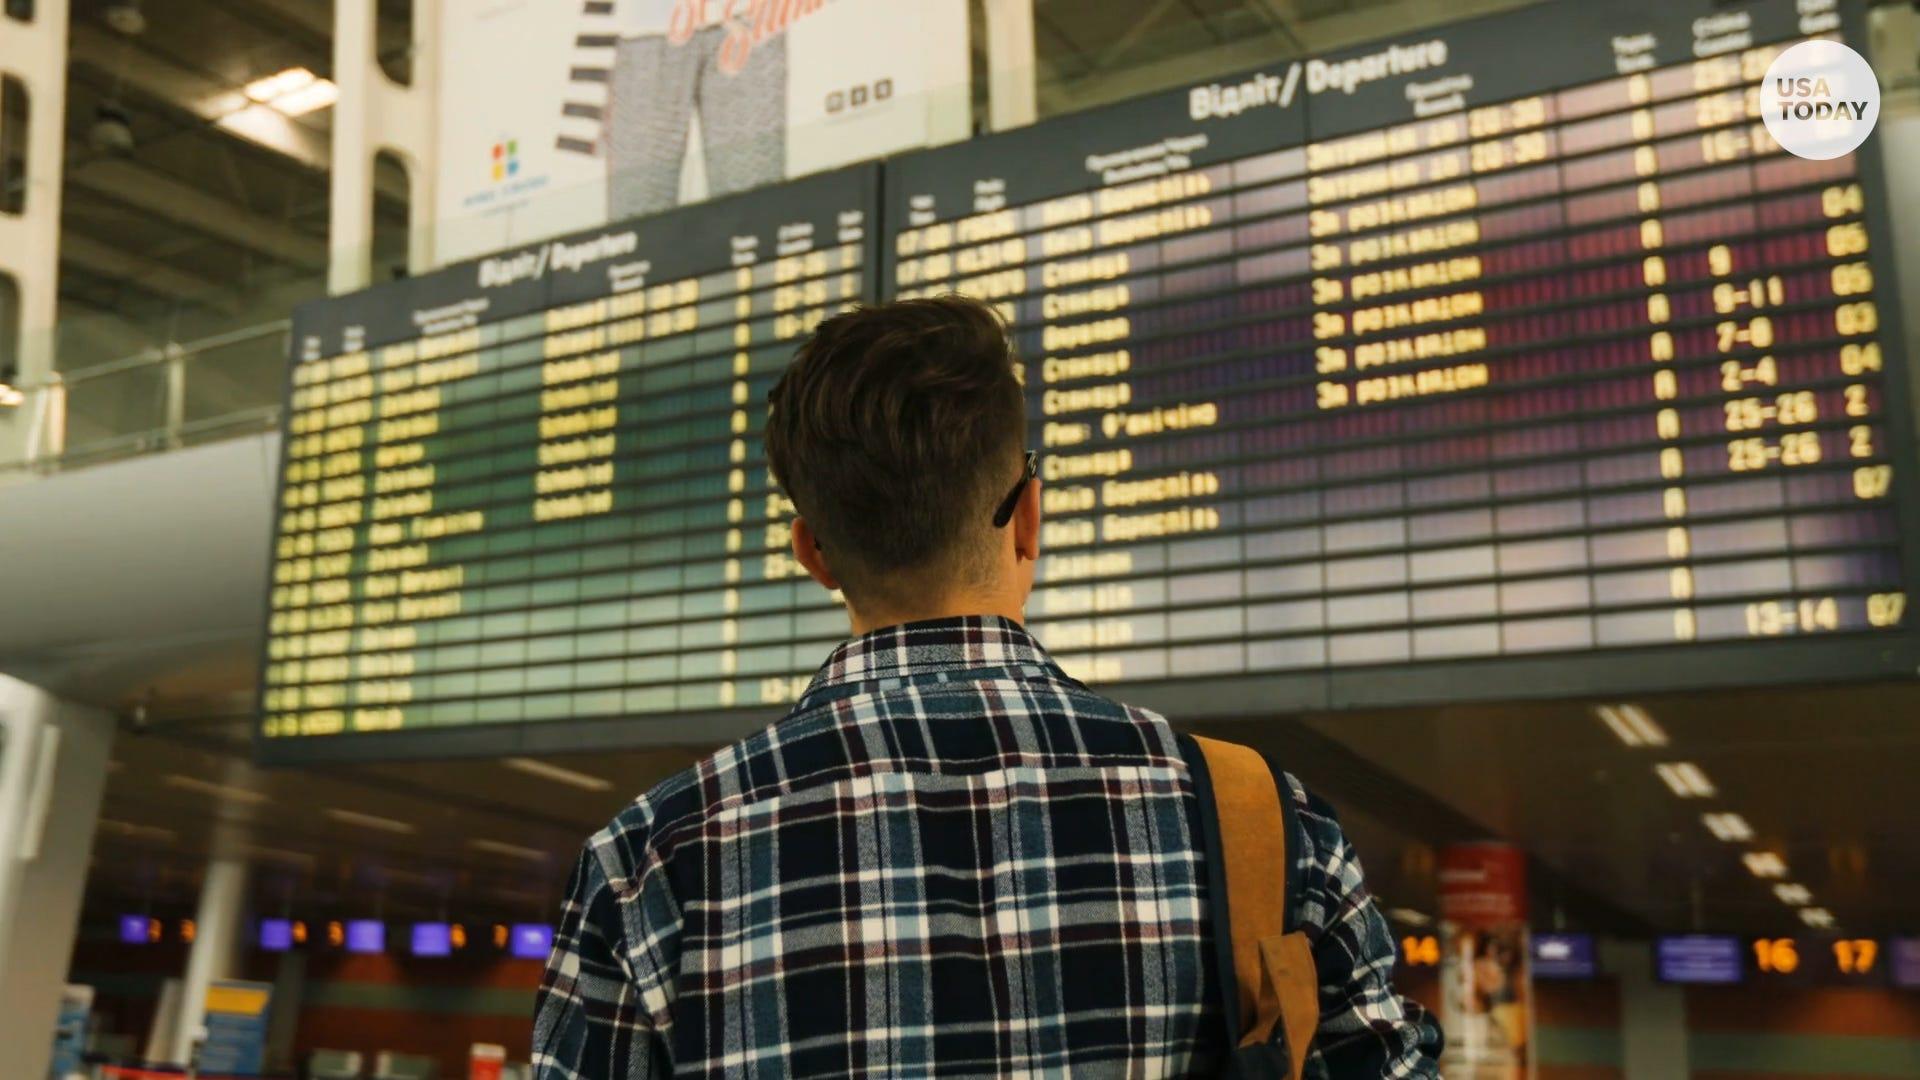 One of the world's longest flights to return